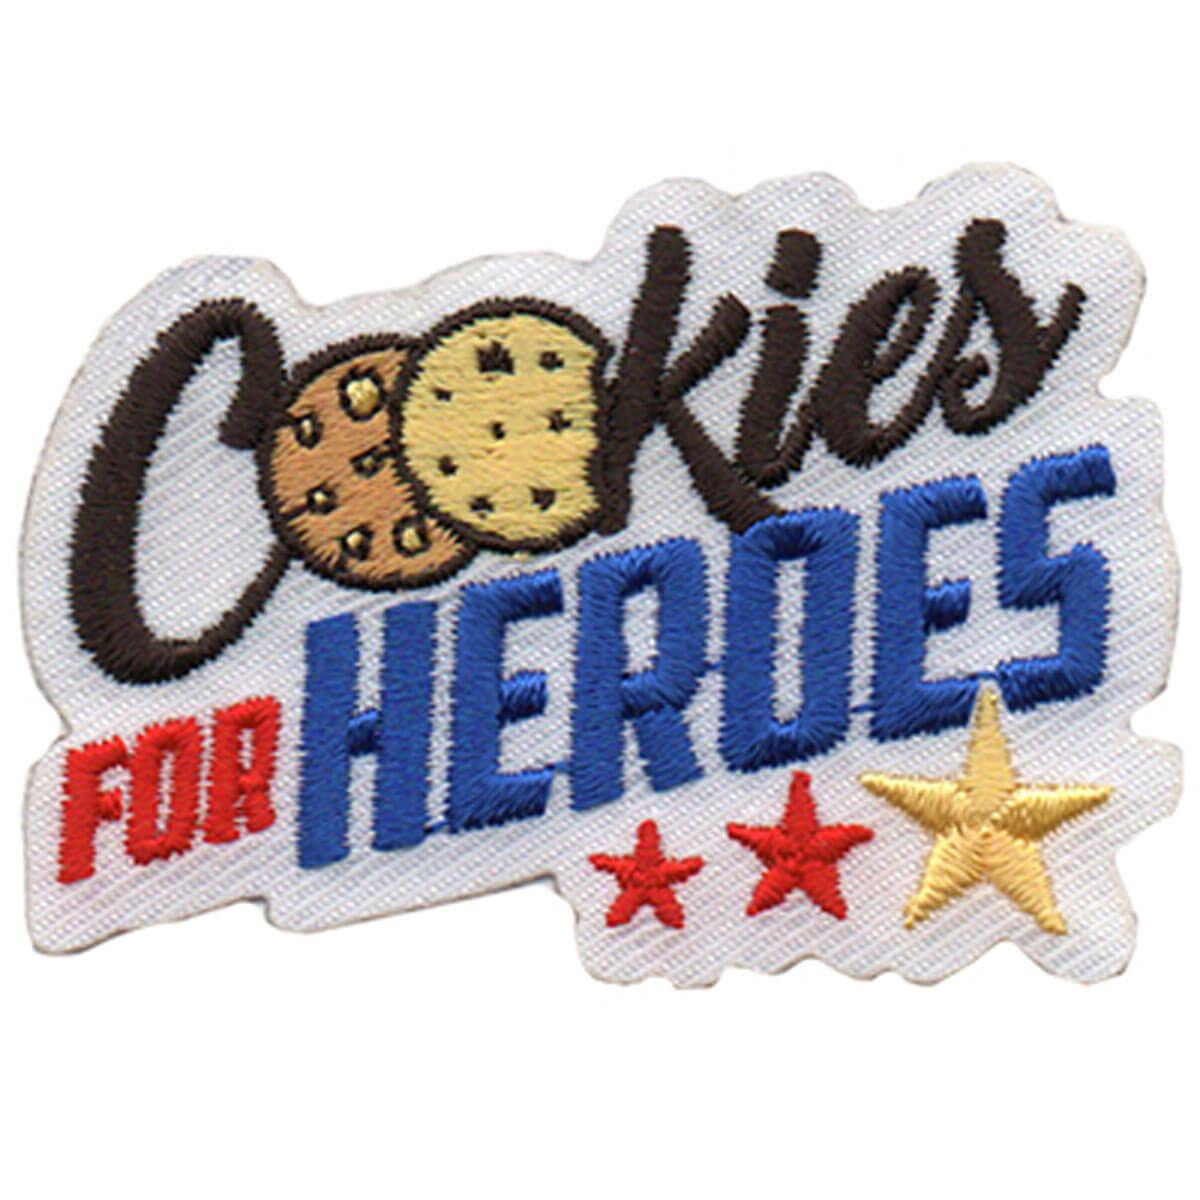 GSNI Cookies for Heros